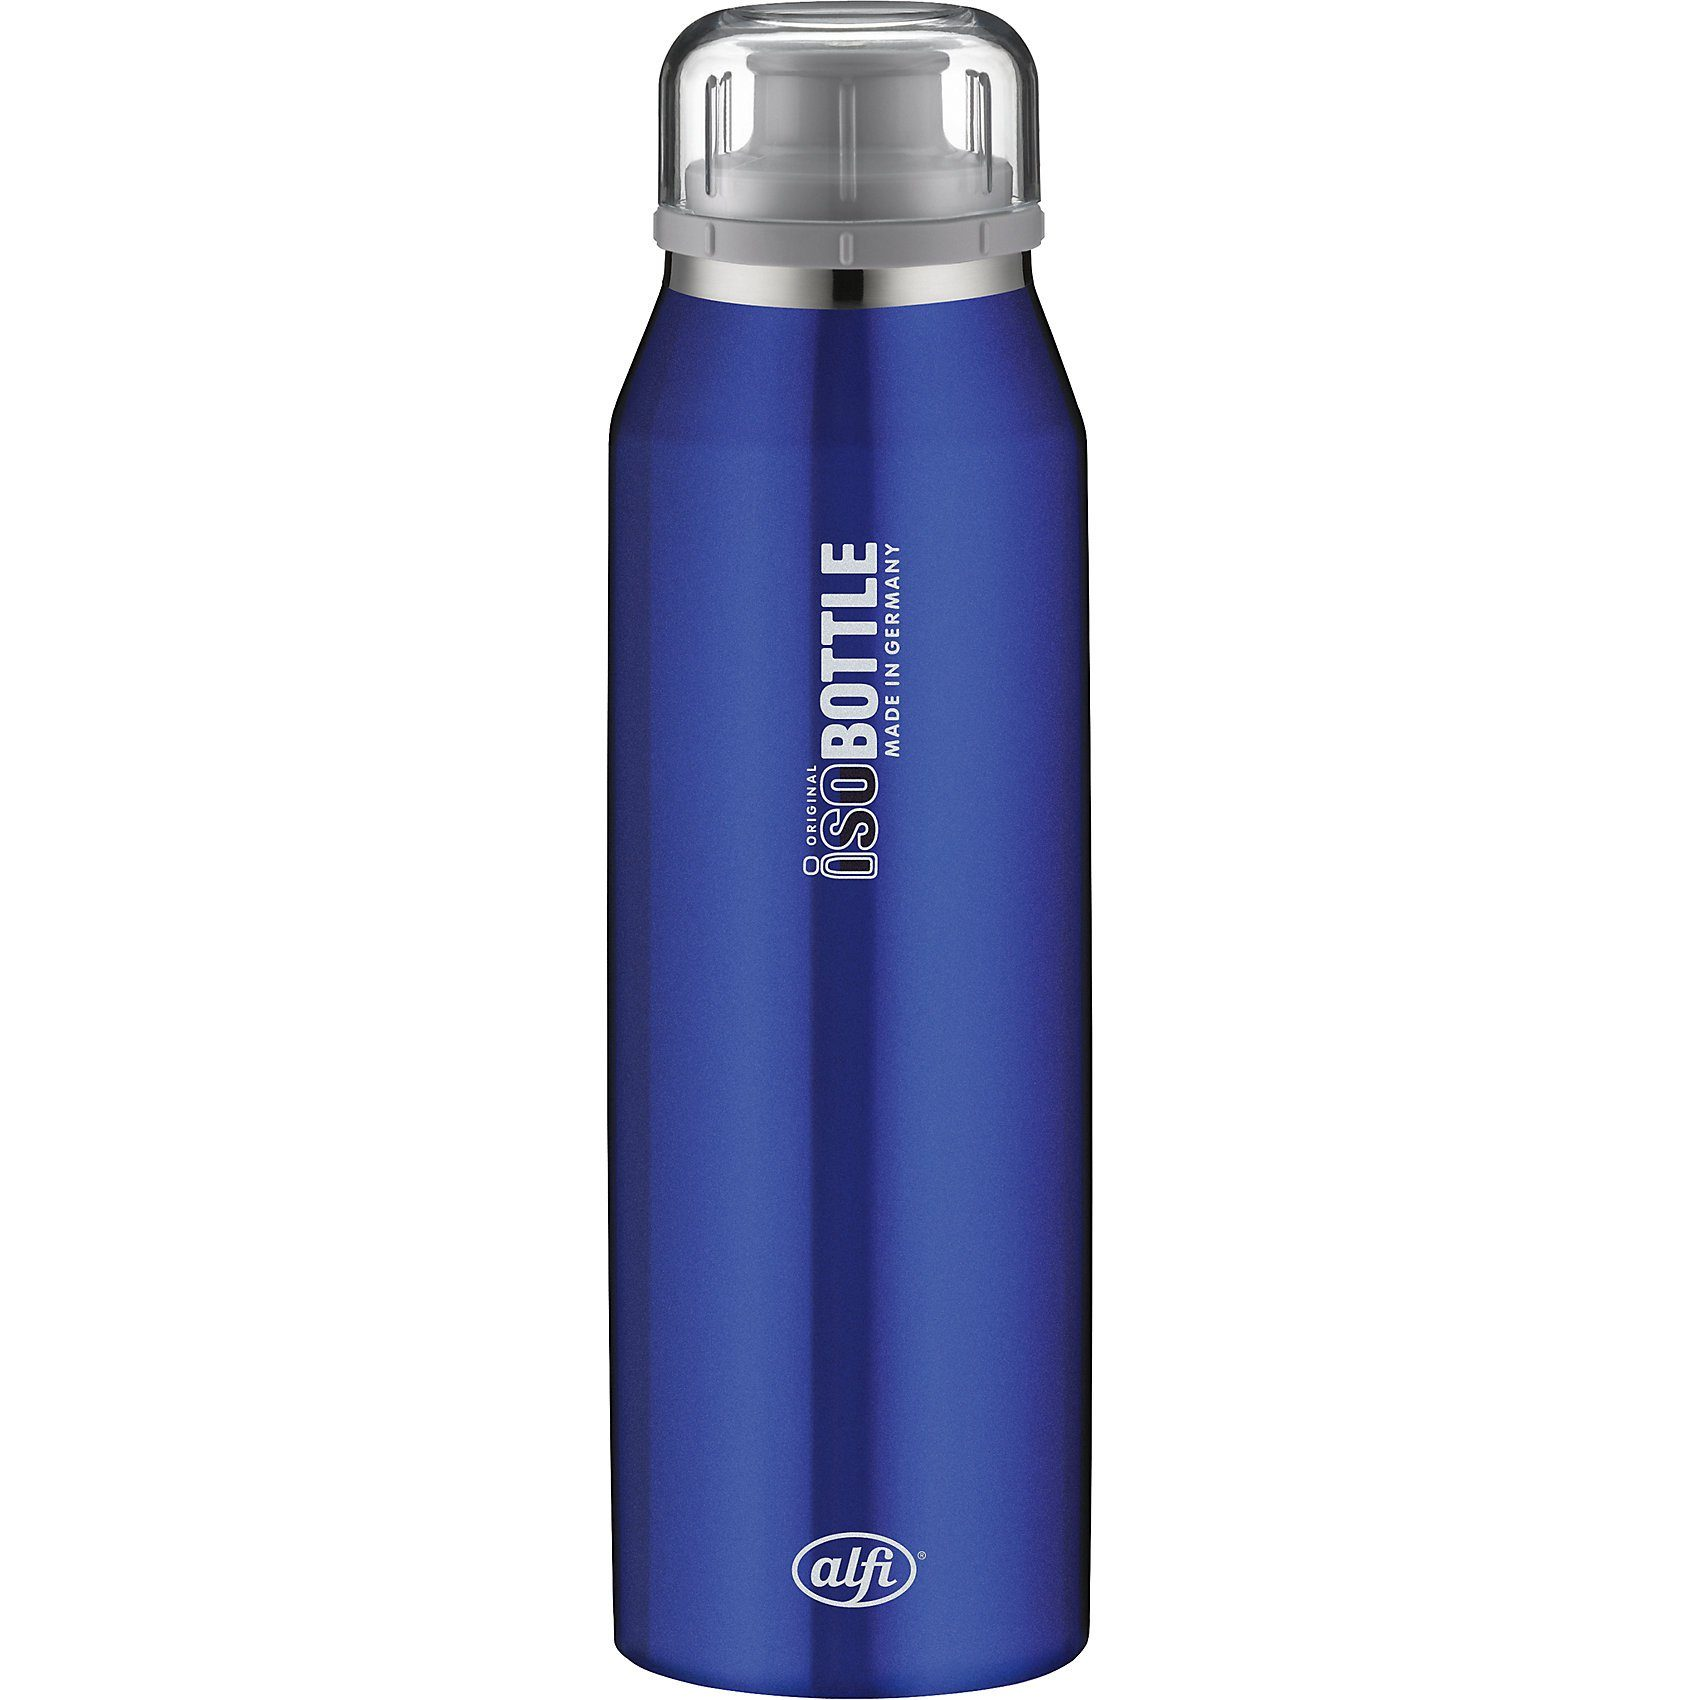 Alfi Isolier-Trinkflasche isoBottle Pure Blau, 500 ml